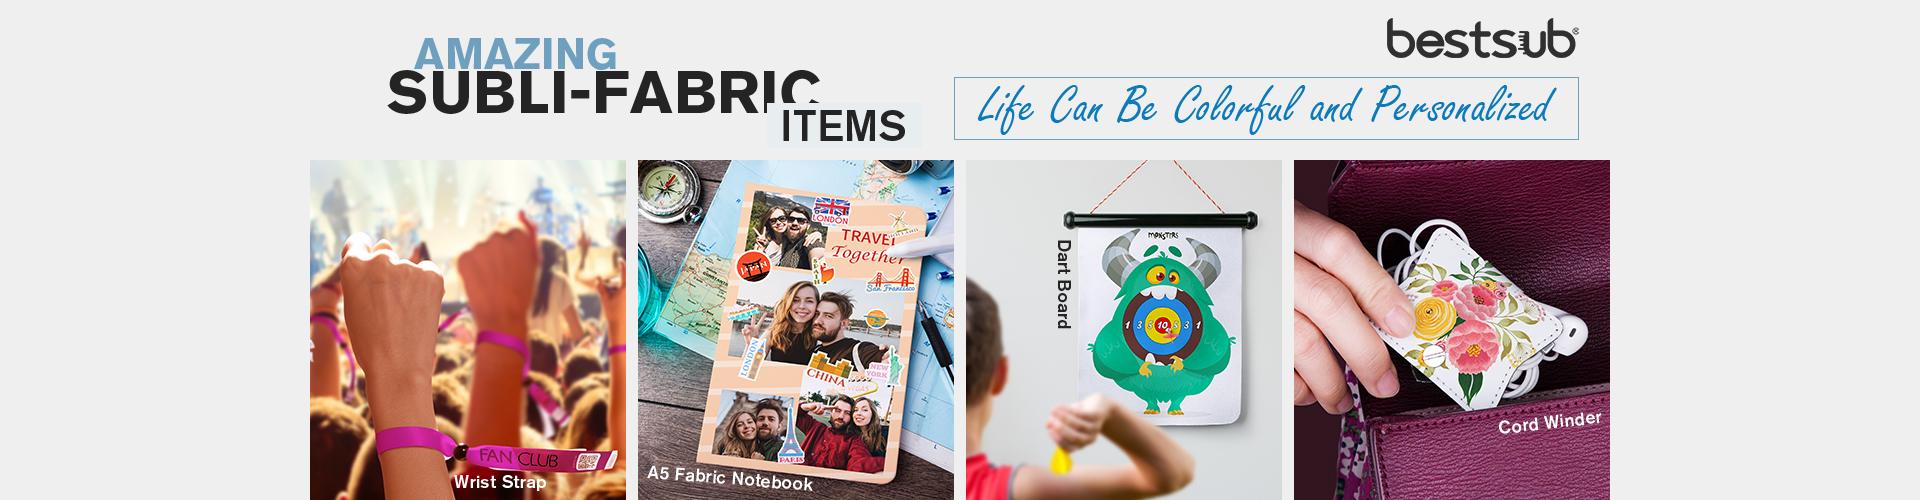 2019-11-19_BestSub_Subli-Fabric_Items_new_web